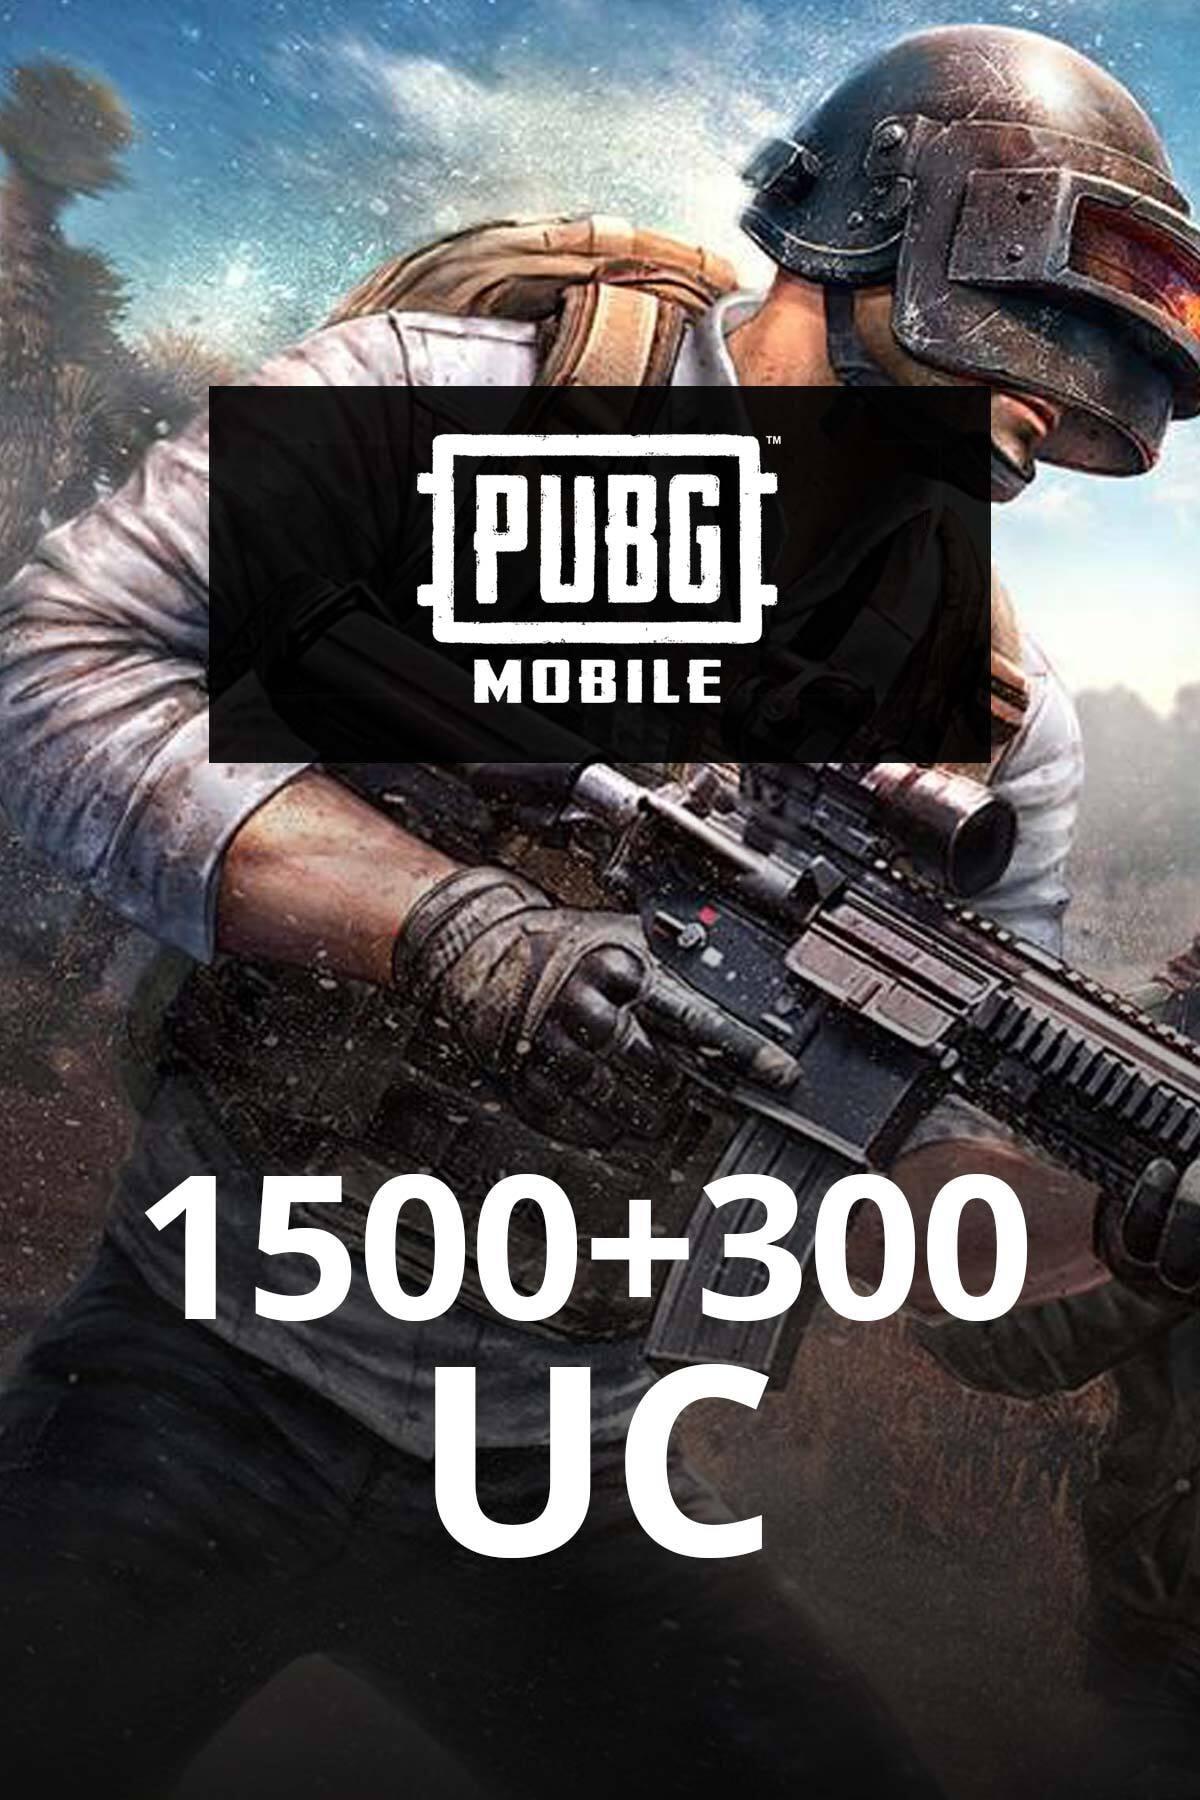 PUBG Mobile 1500 + 300 UC